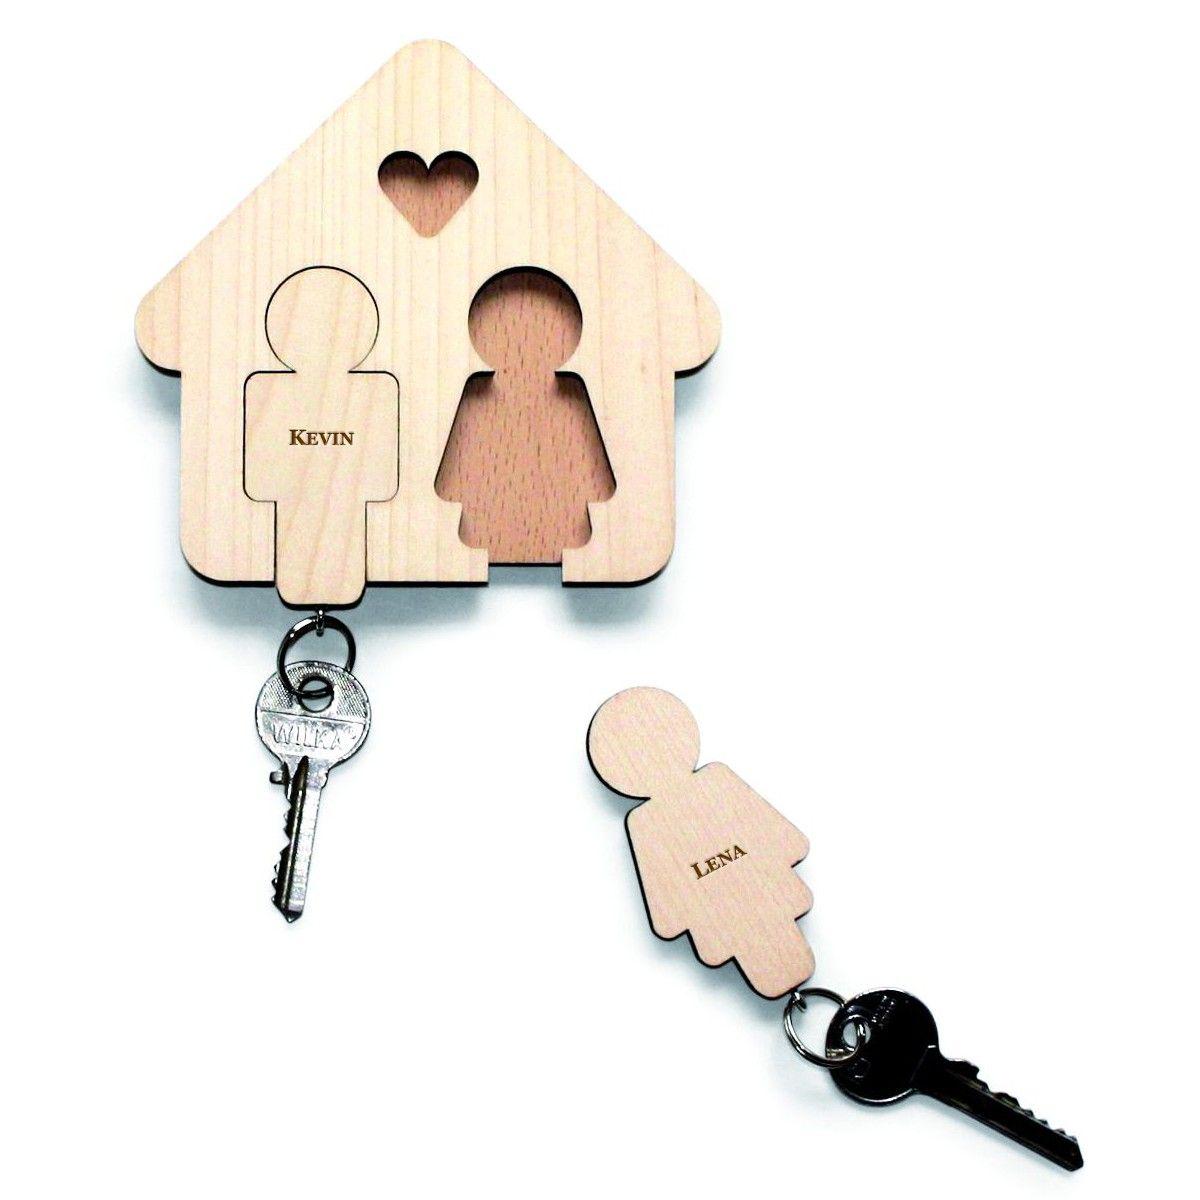 Regali Per Anniversario Matrimonio Idee Legno Idee Per Anniversario Invenzioni